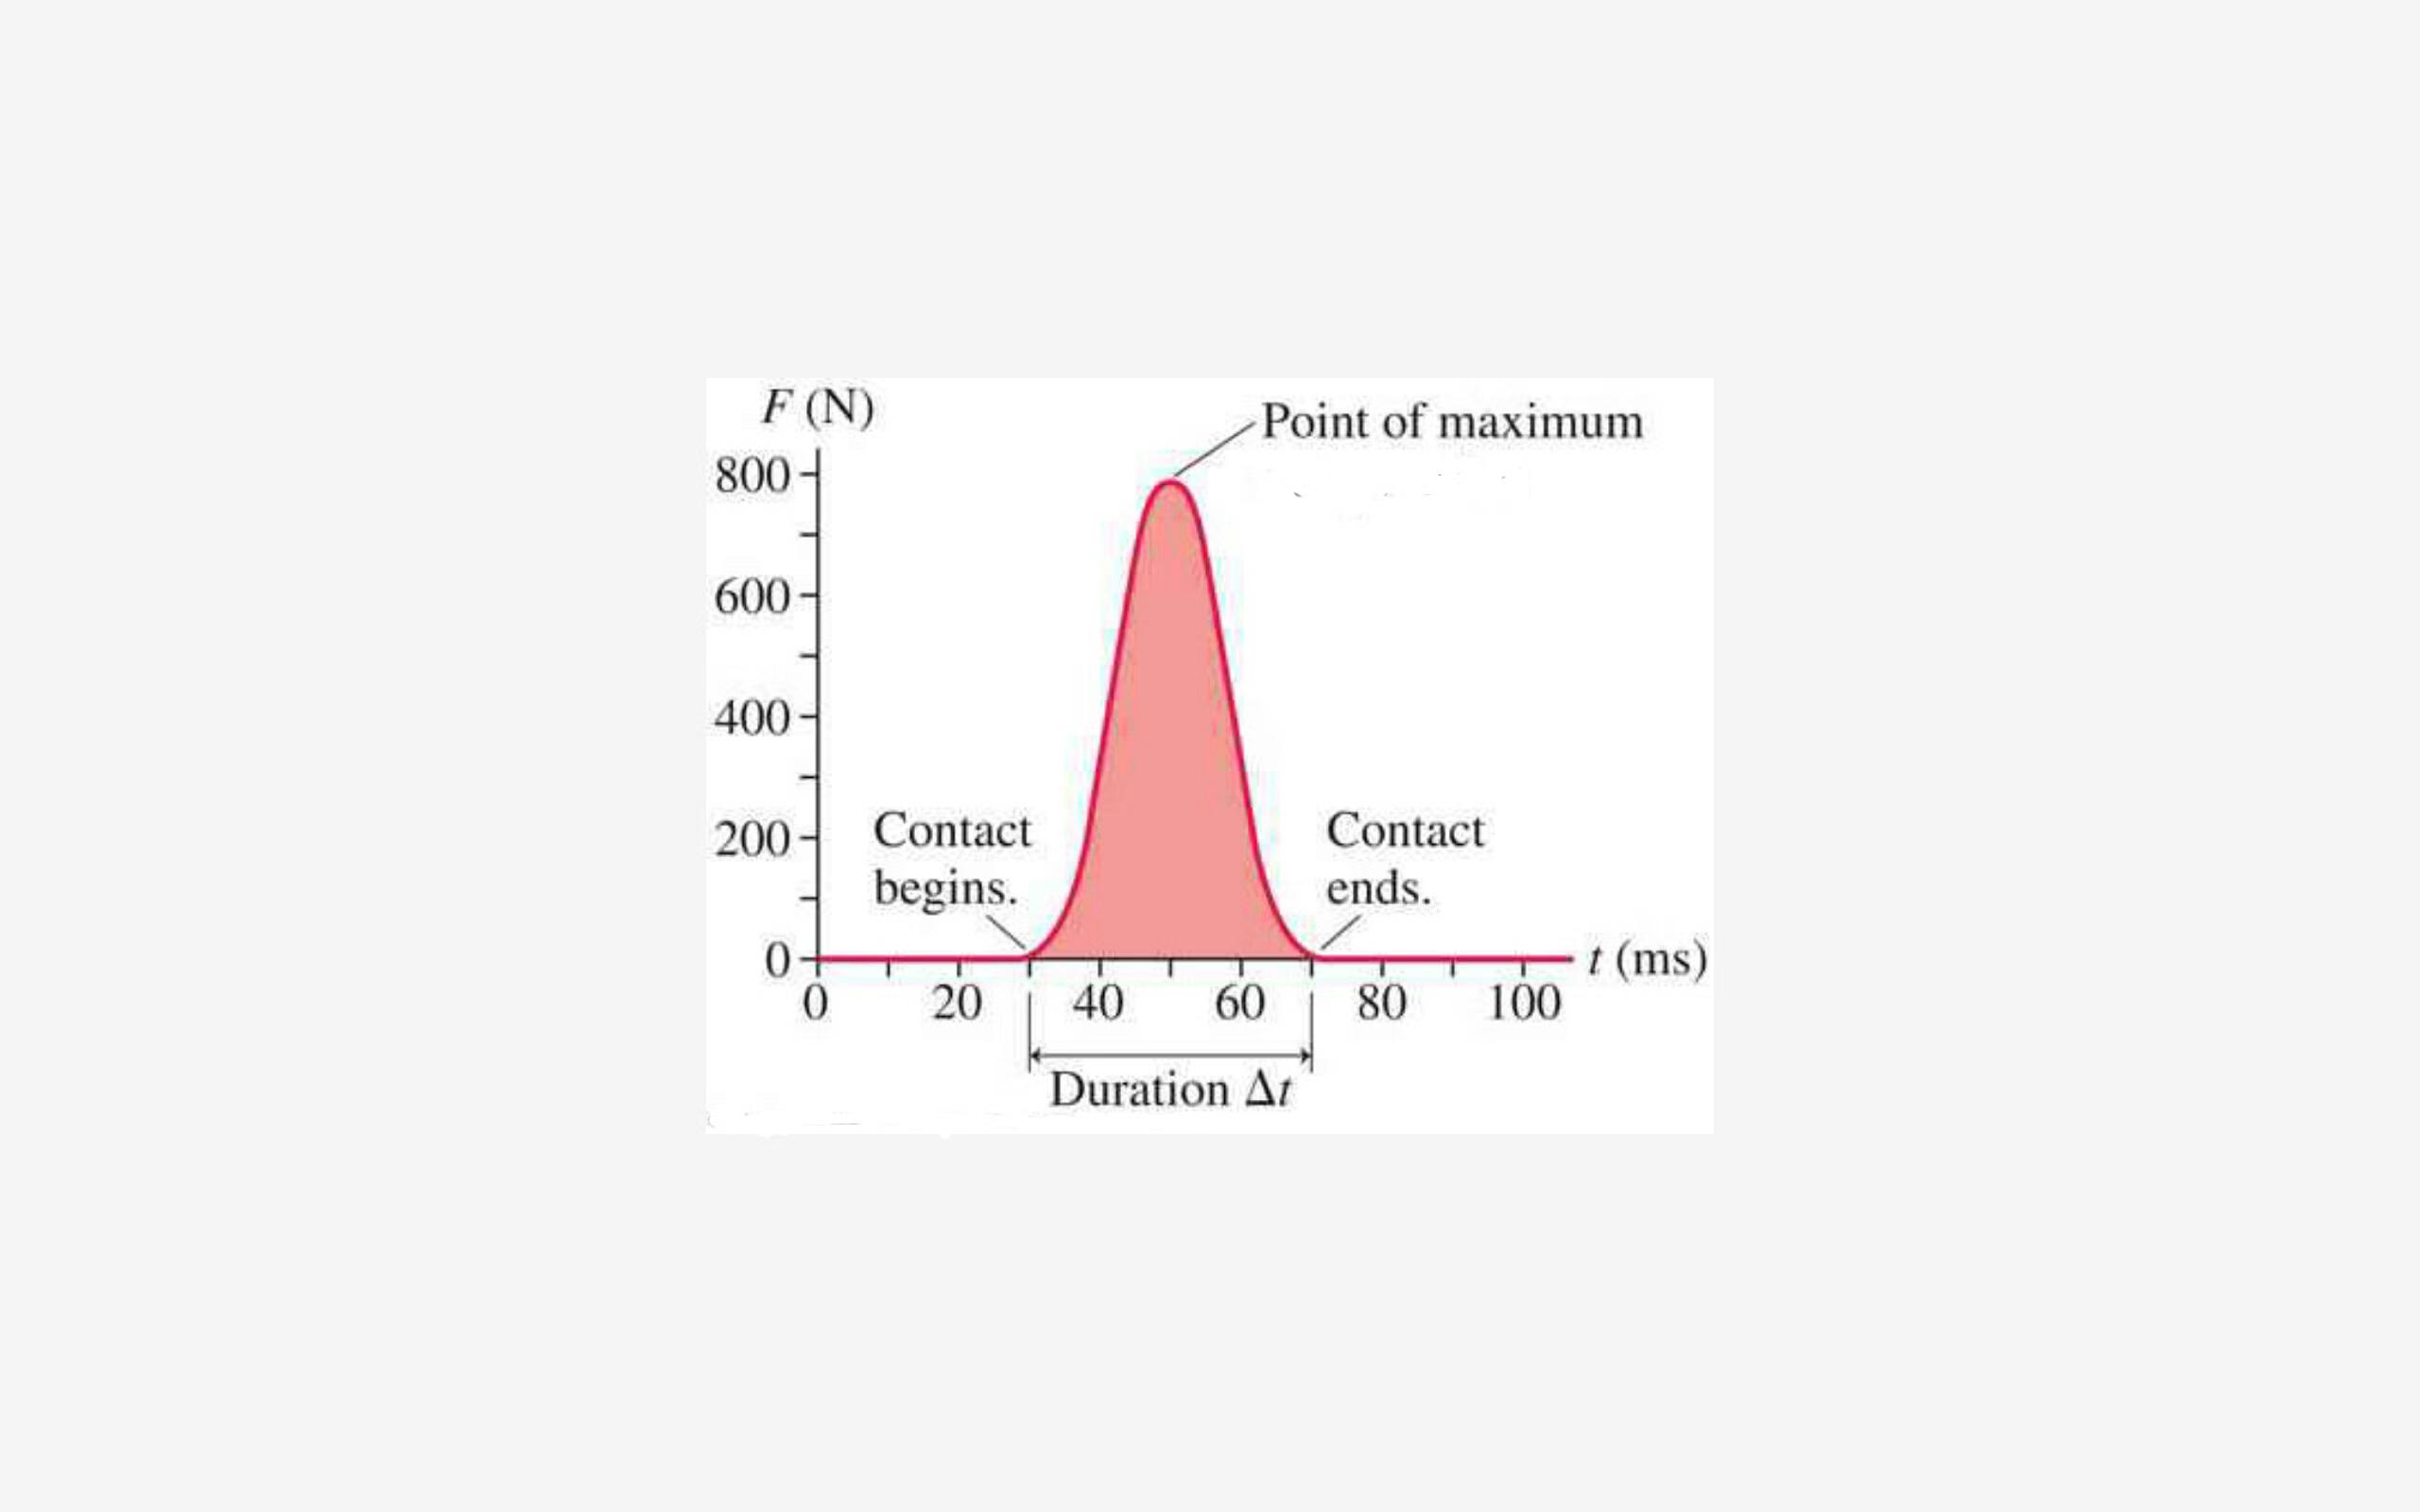 http://melephysics.weebly.com/lab-1-impulse-lab.html